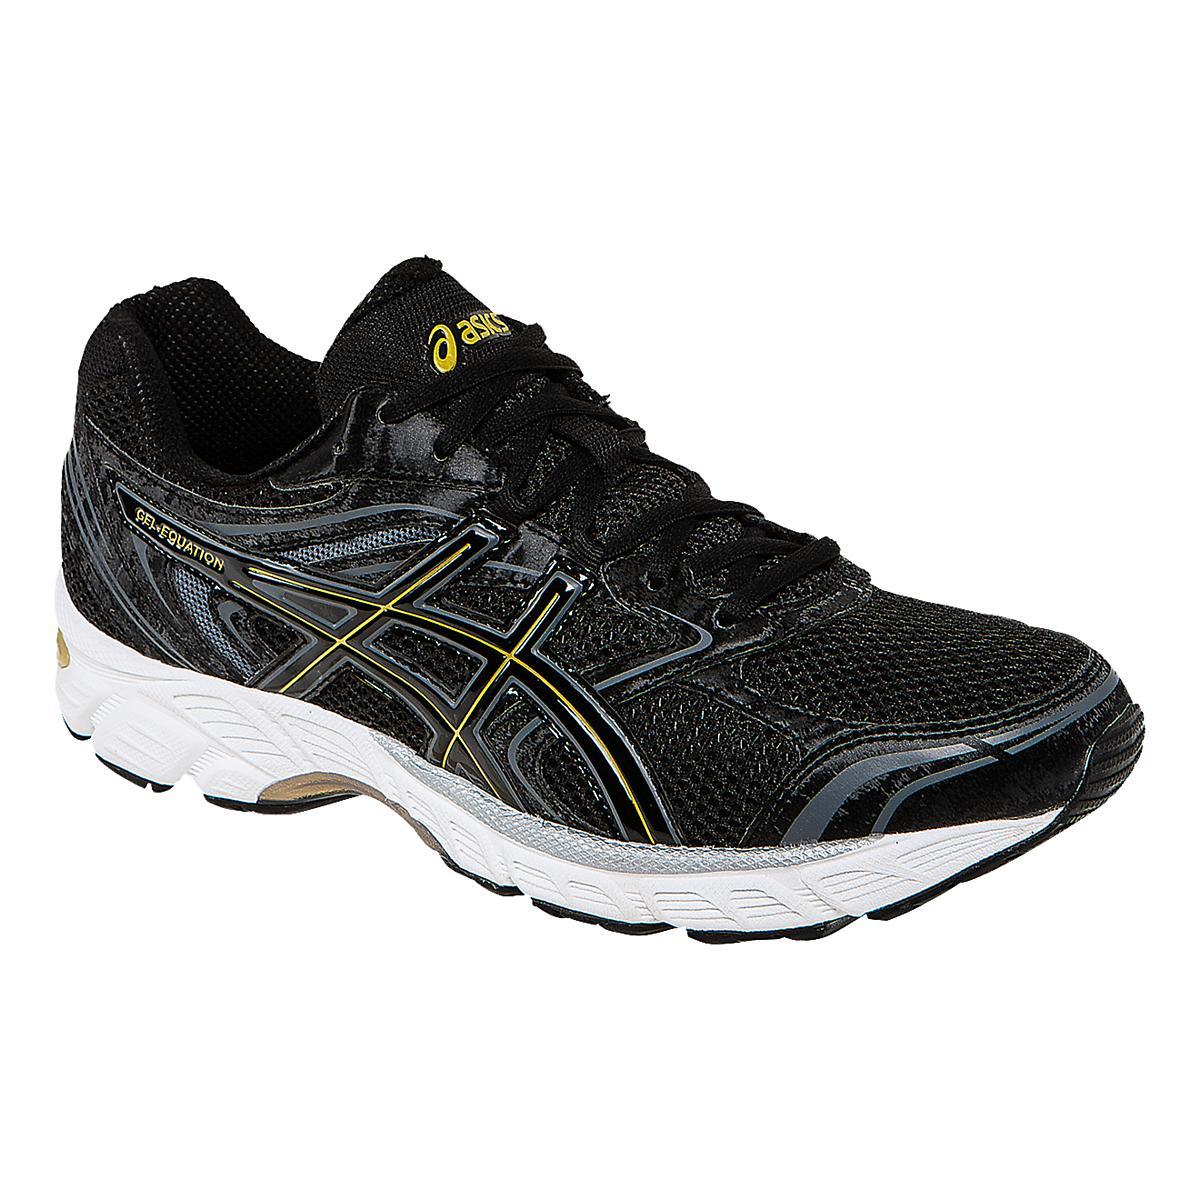 Chaussures de Chaussures course chez pour hommes ASICS GEL Equation 8 8 chez Road Runner Sports 6b47100 - resepmasakannusantara.website